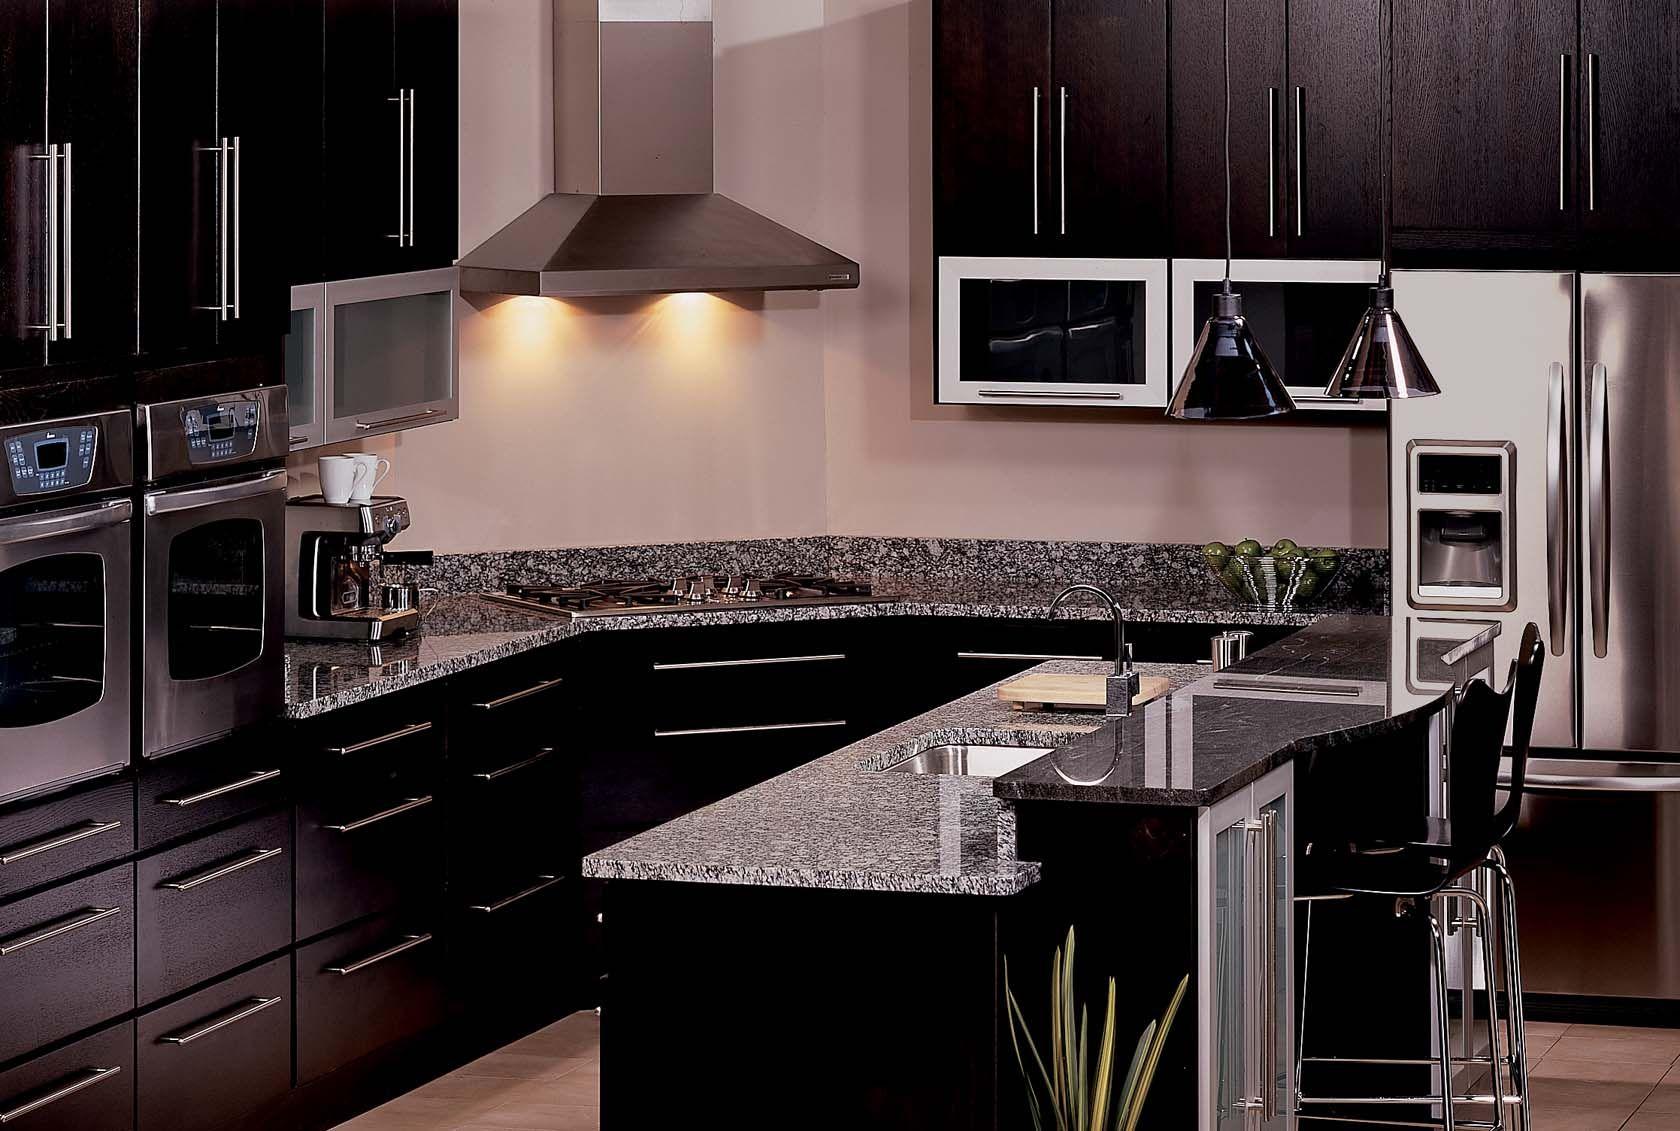 The Manhattan Style Kabinart Kitchen Comes Complete With A High Performance Hood Modern Kitchen Kitchen Kitchen Cabinets